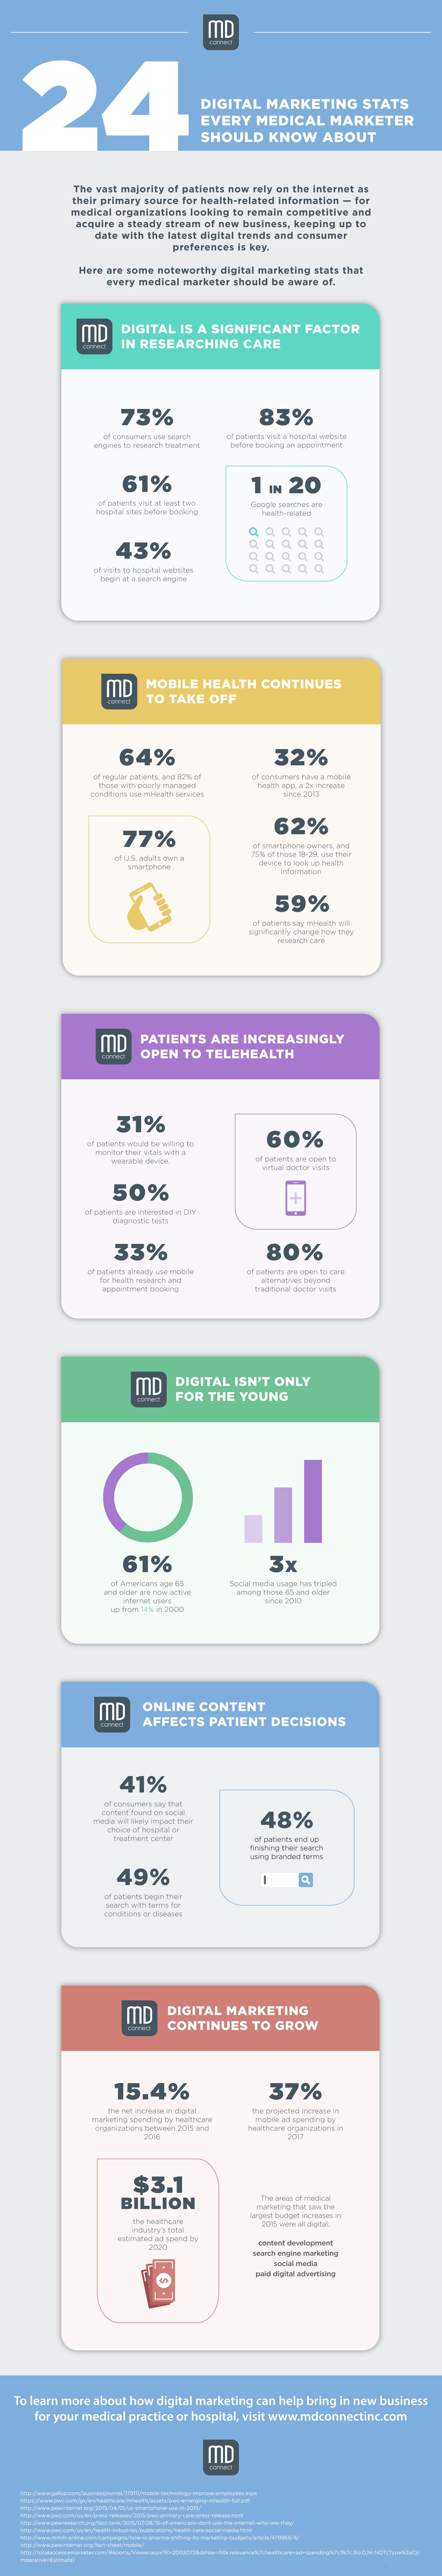 24-Digital-Advertising-Stats-FINAL3.png